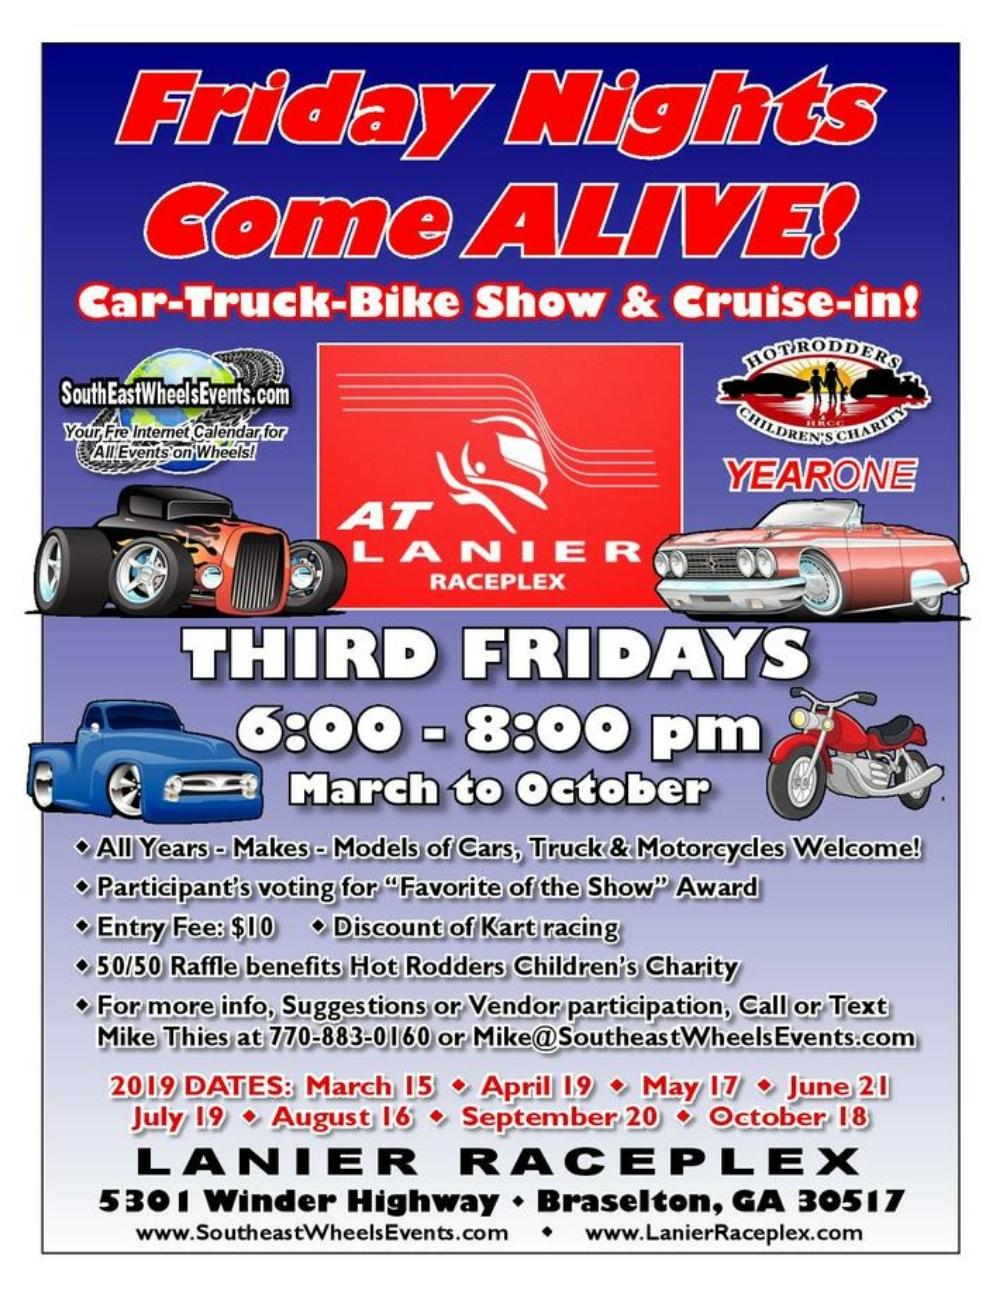 Friday Nights Come Alive! Lanier Raceplex